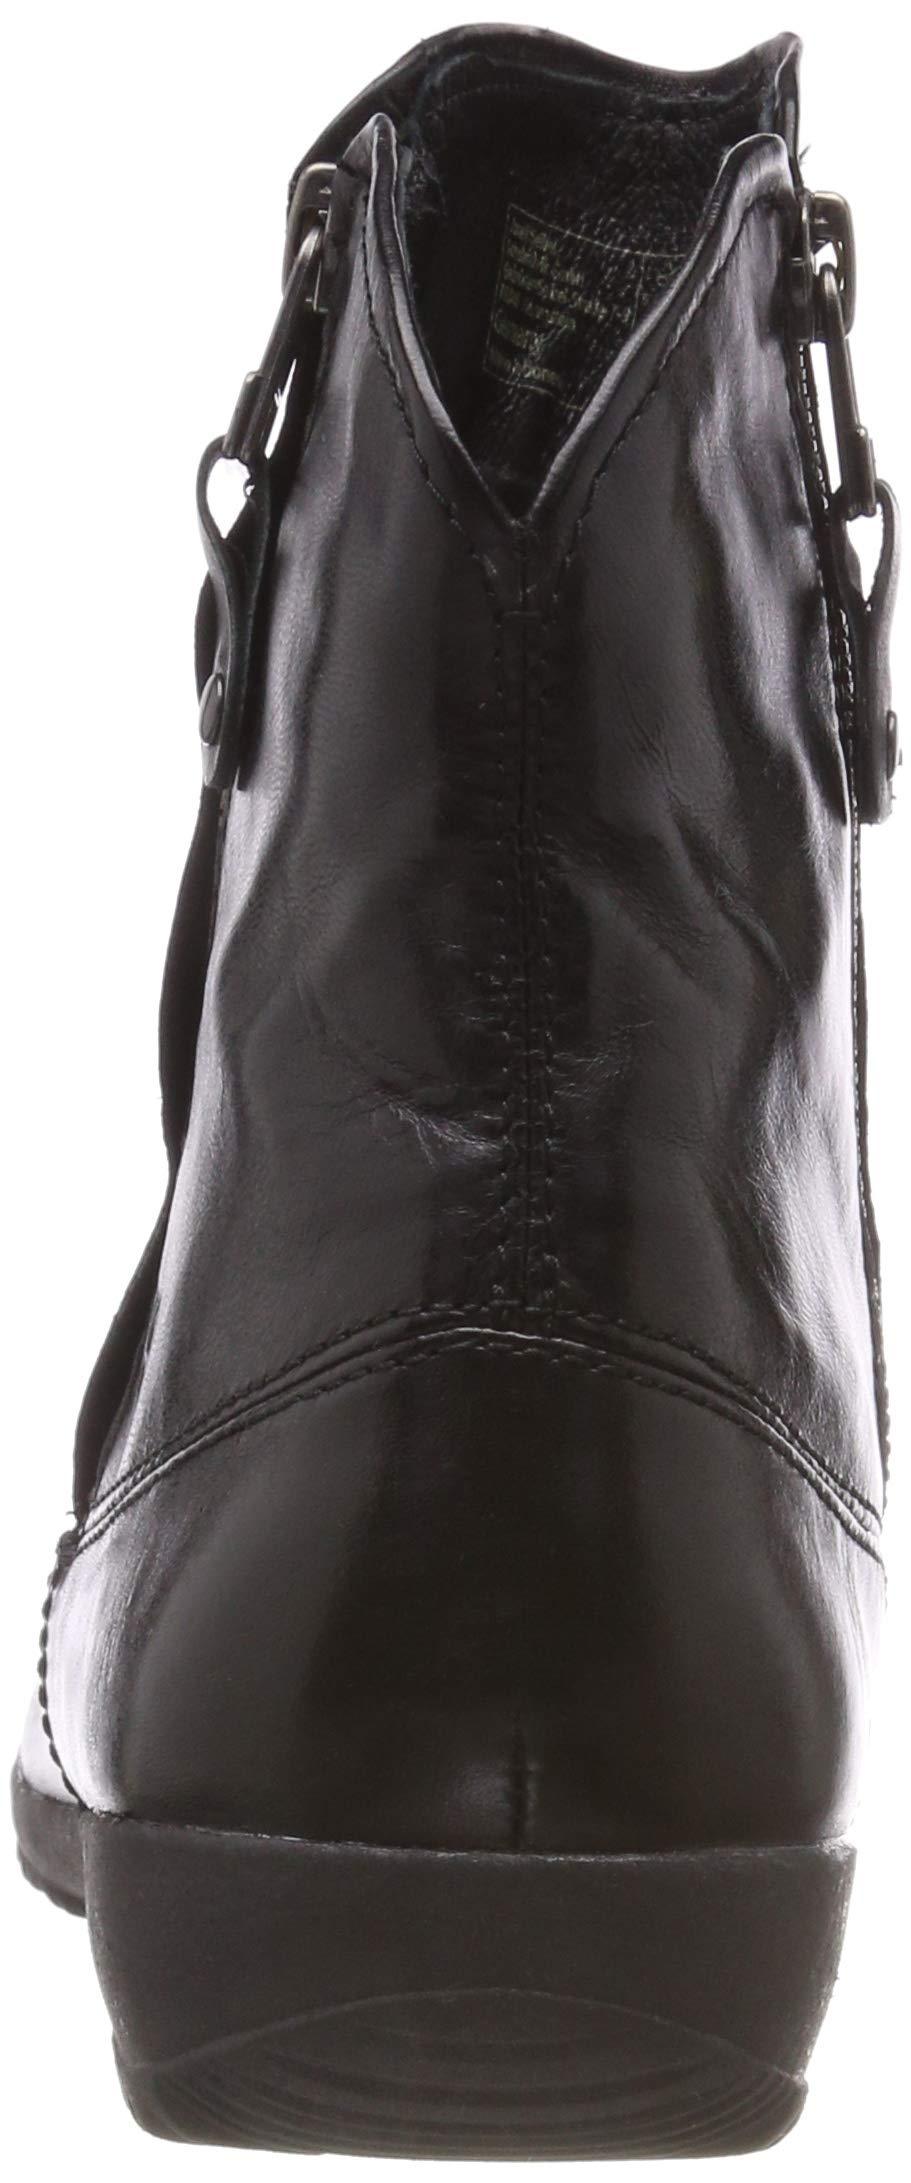 Josef Seibel Women's Naly 24 Slouch Boots 2